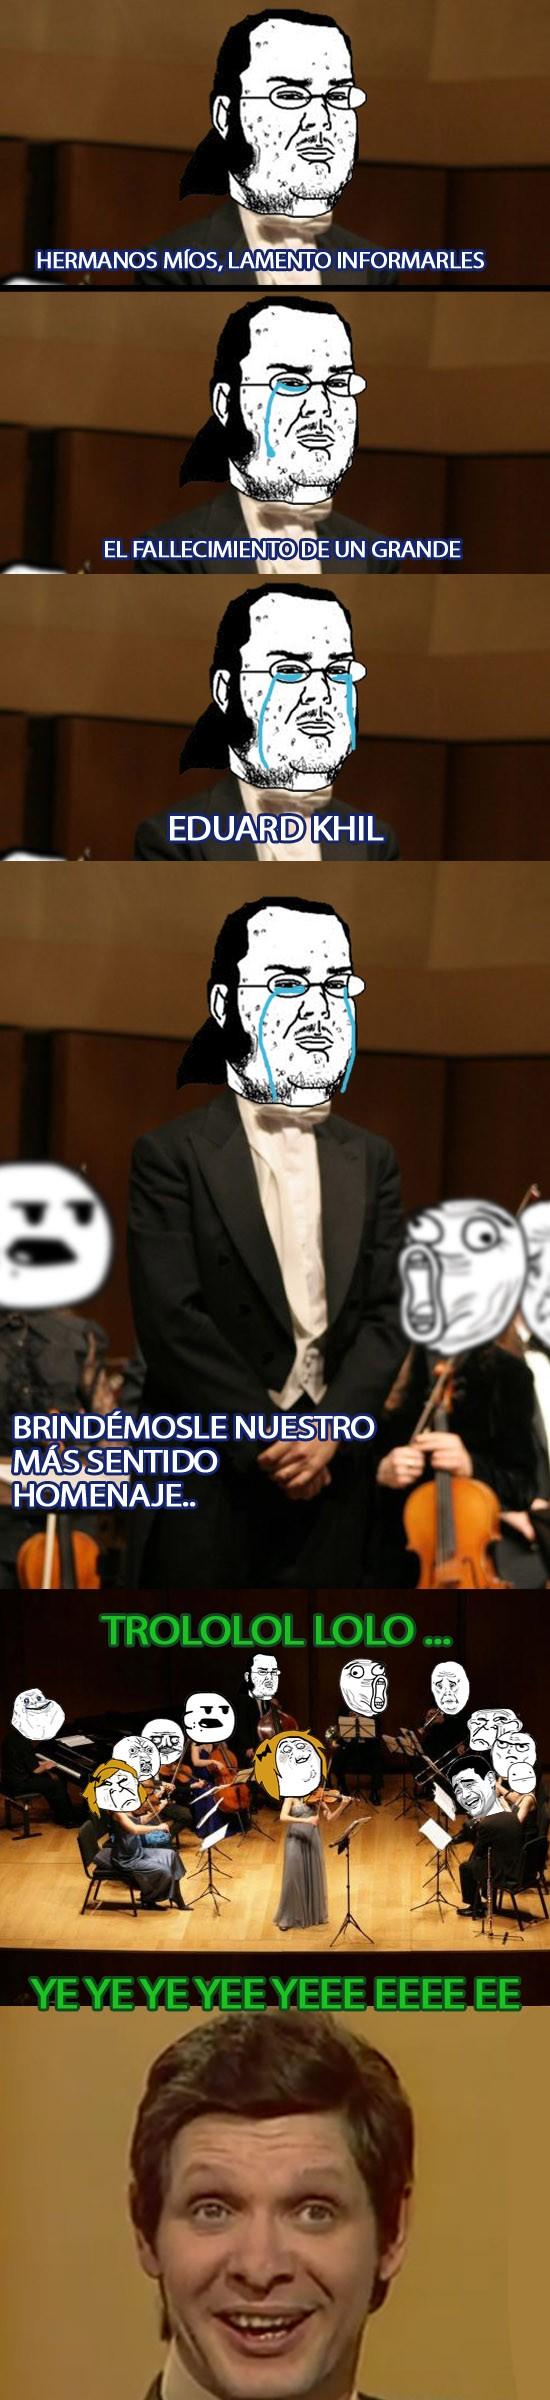 Eduard Khil,forever alone,friki,lol,memes,otros,trollface,trololo